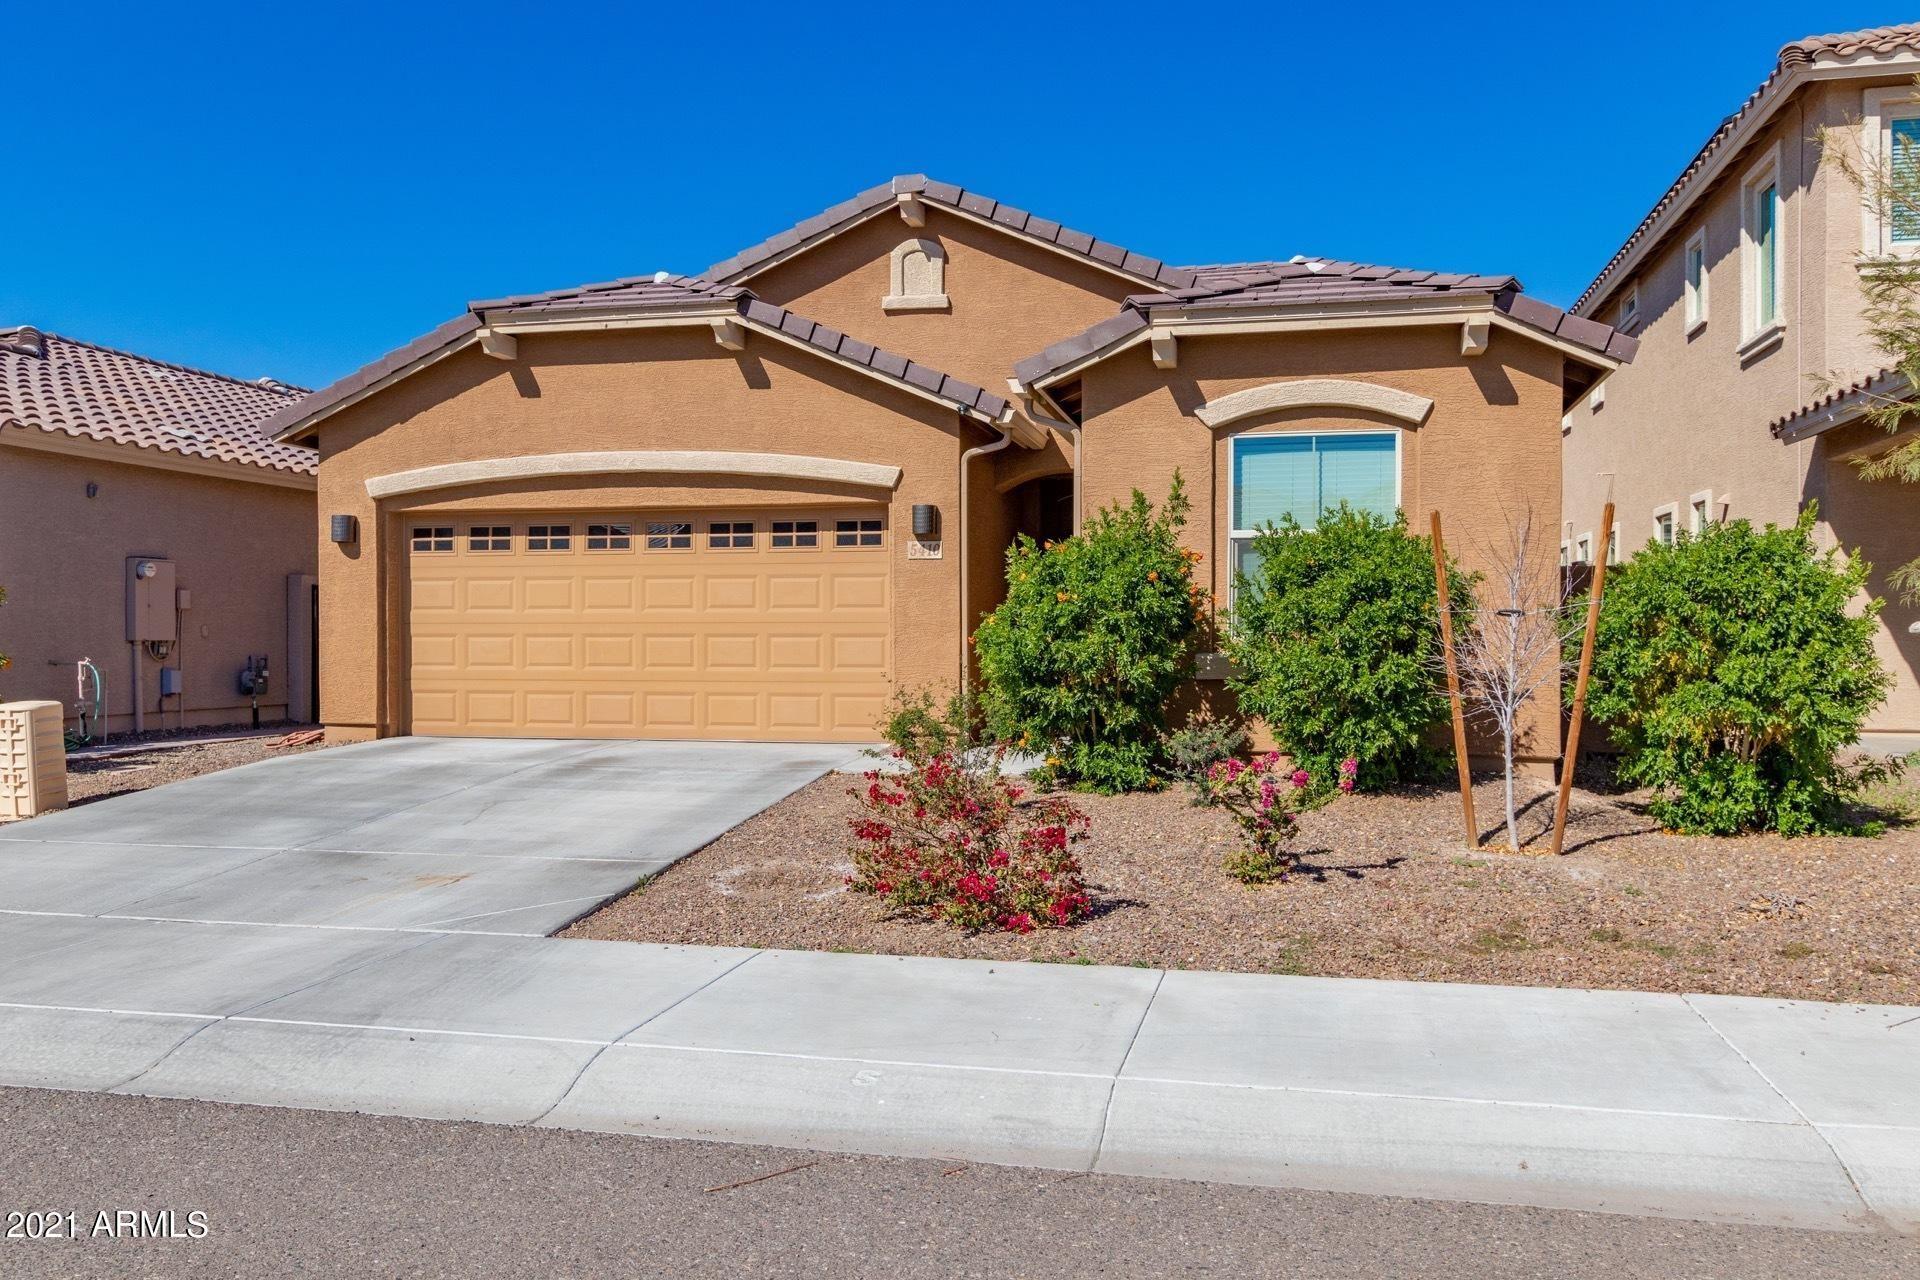 5410 W HACKAMORE Drive, Phoenix, AZ 85083 - MLS#: 6201048